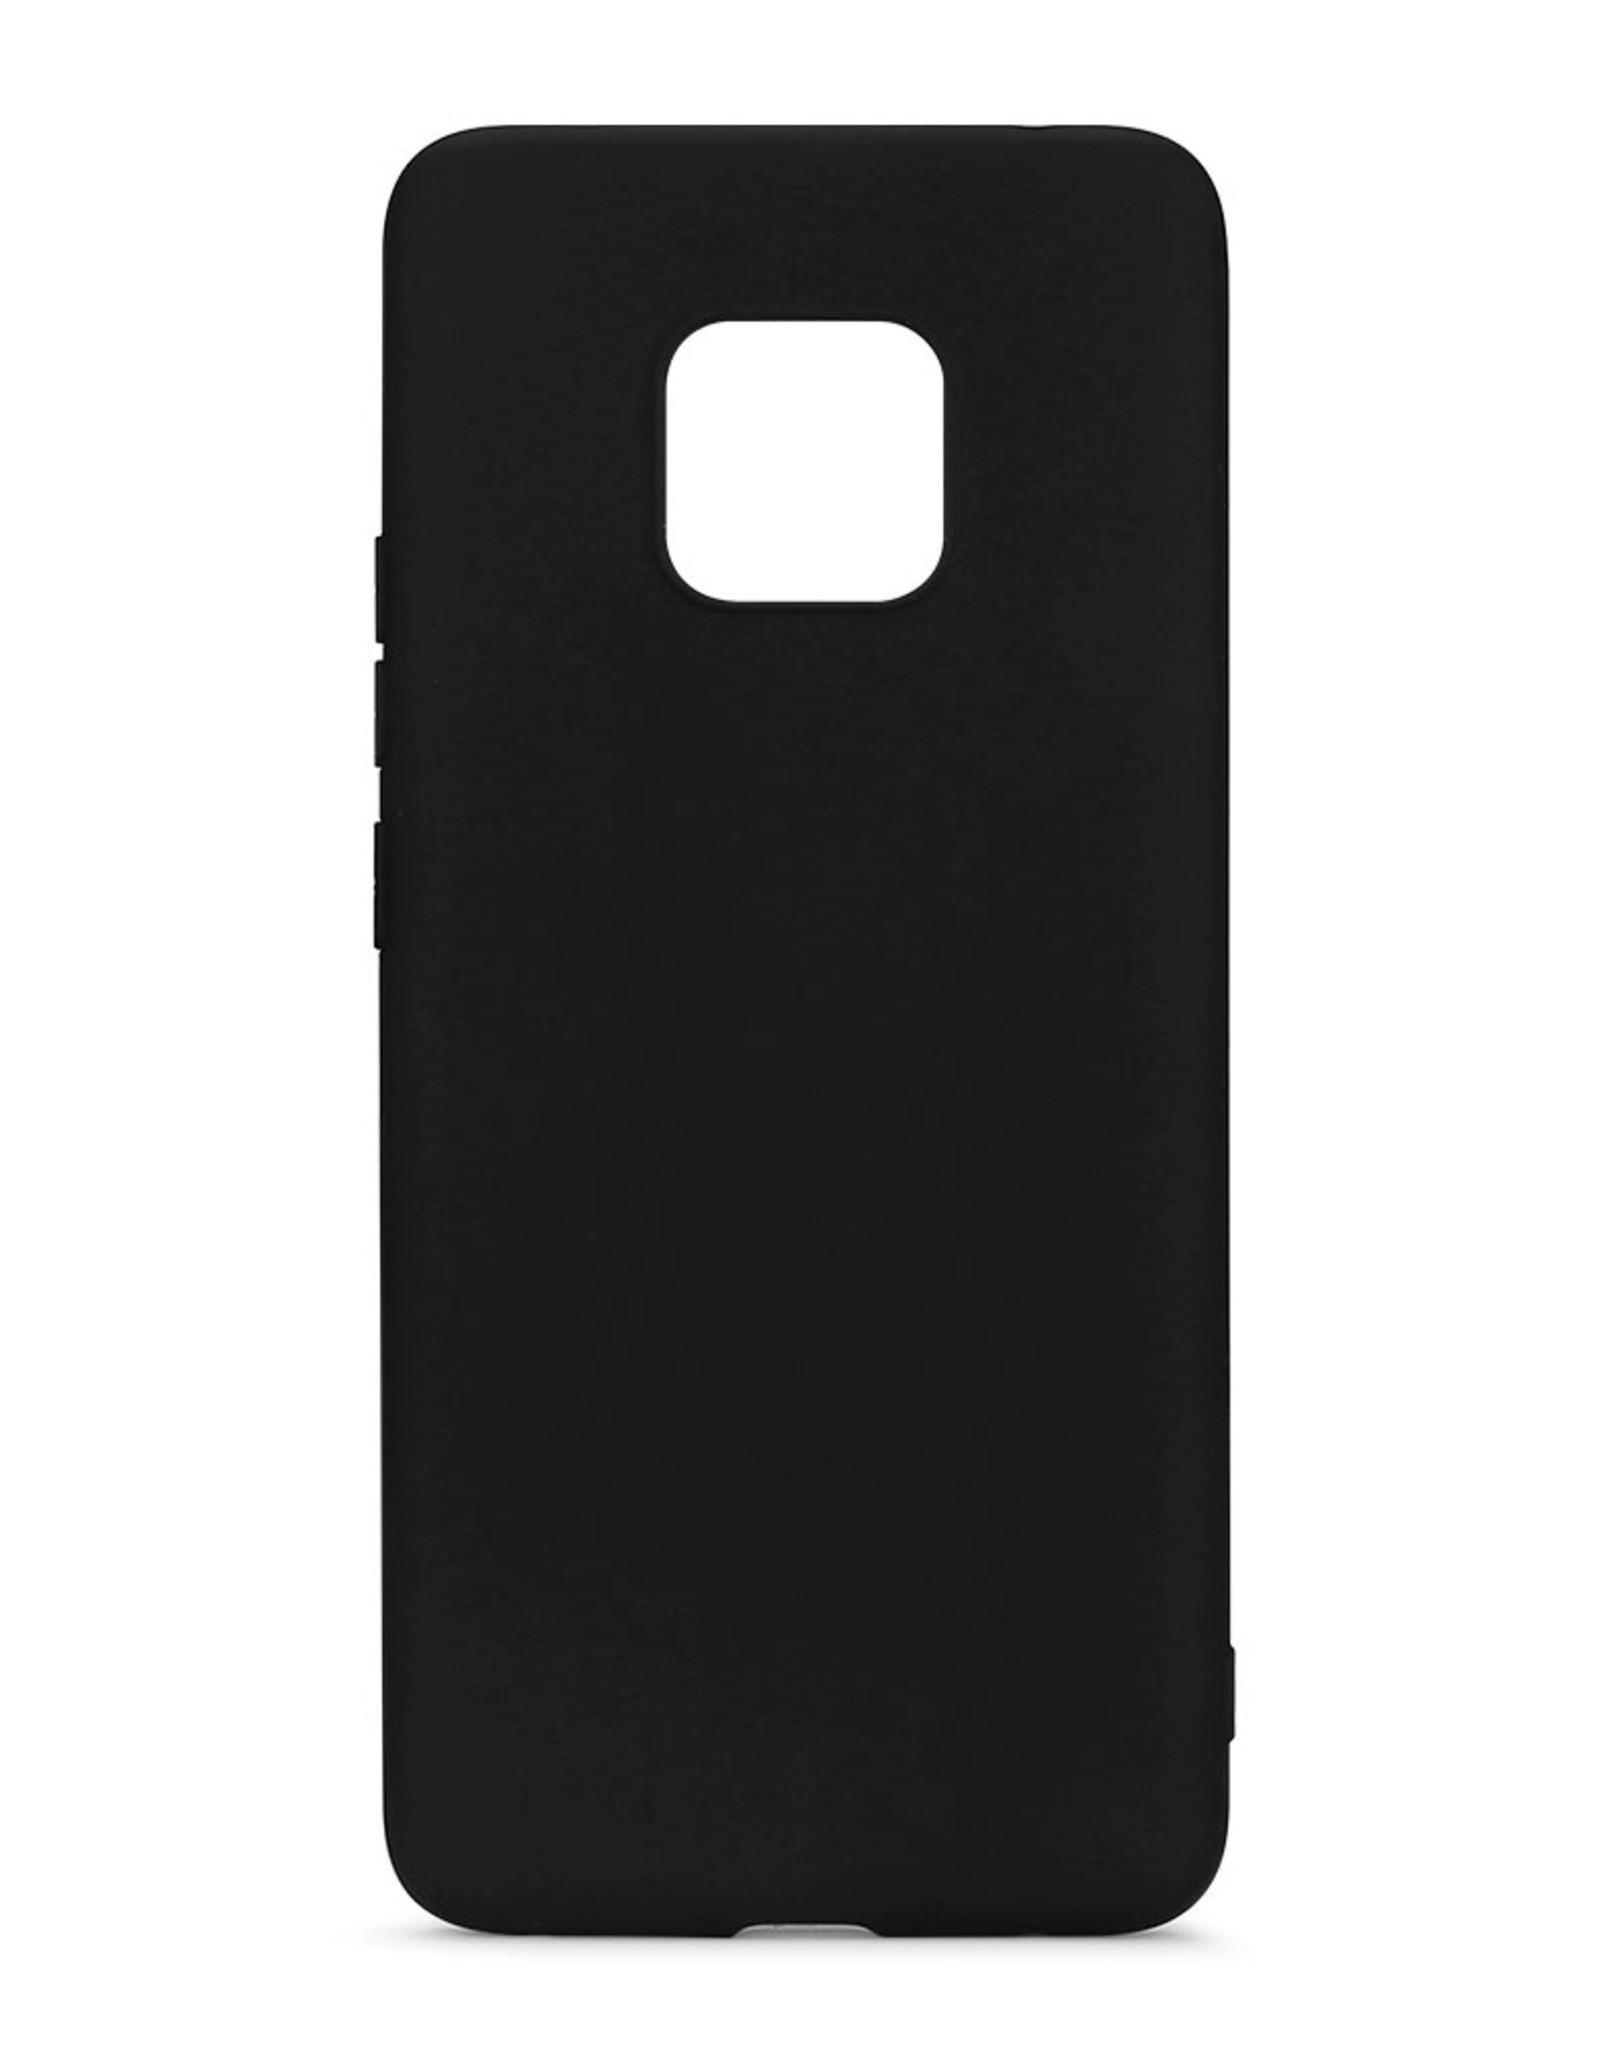 Blu Element Blu Element - Gel Skin Case Black for Huawei Mate20 Pro 120-1282